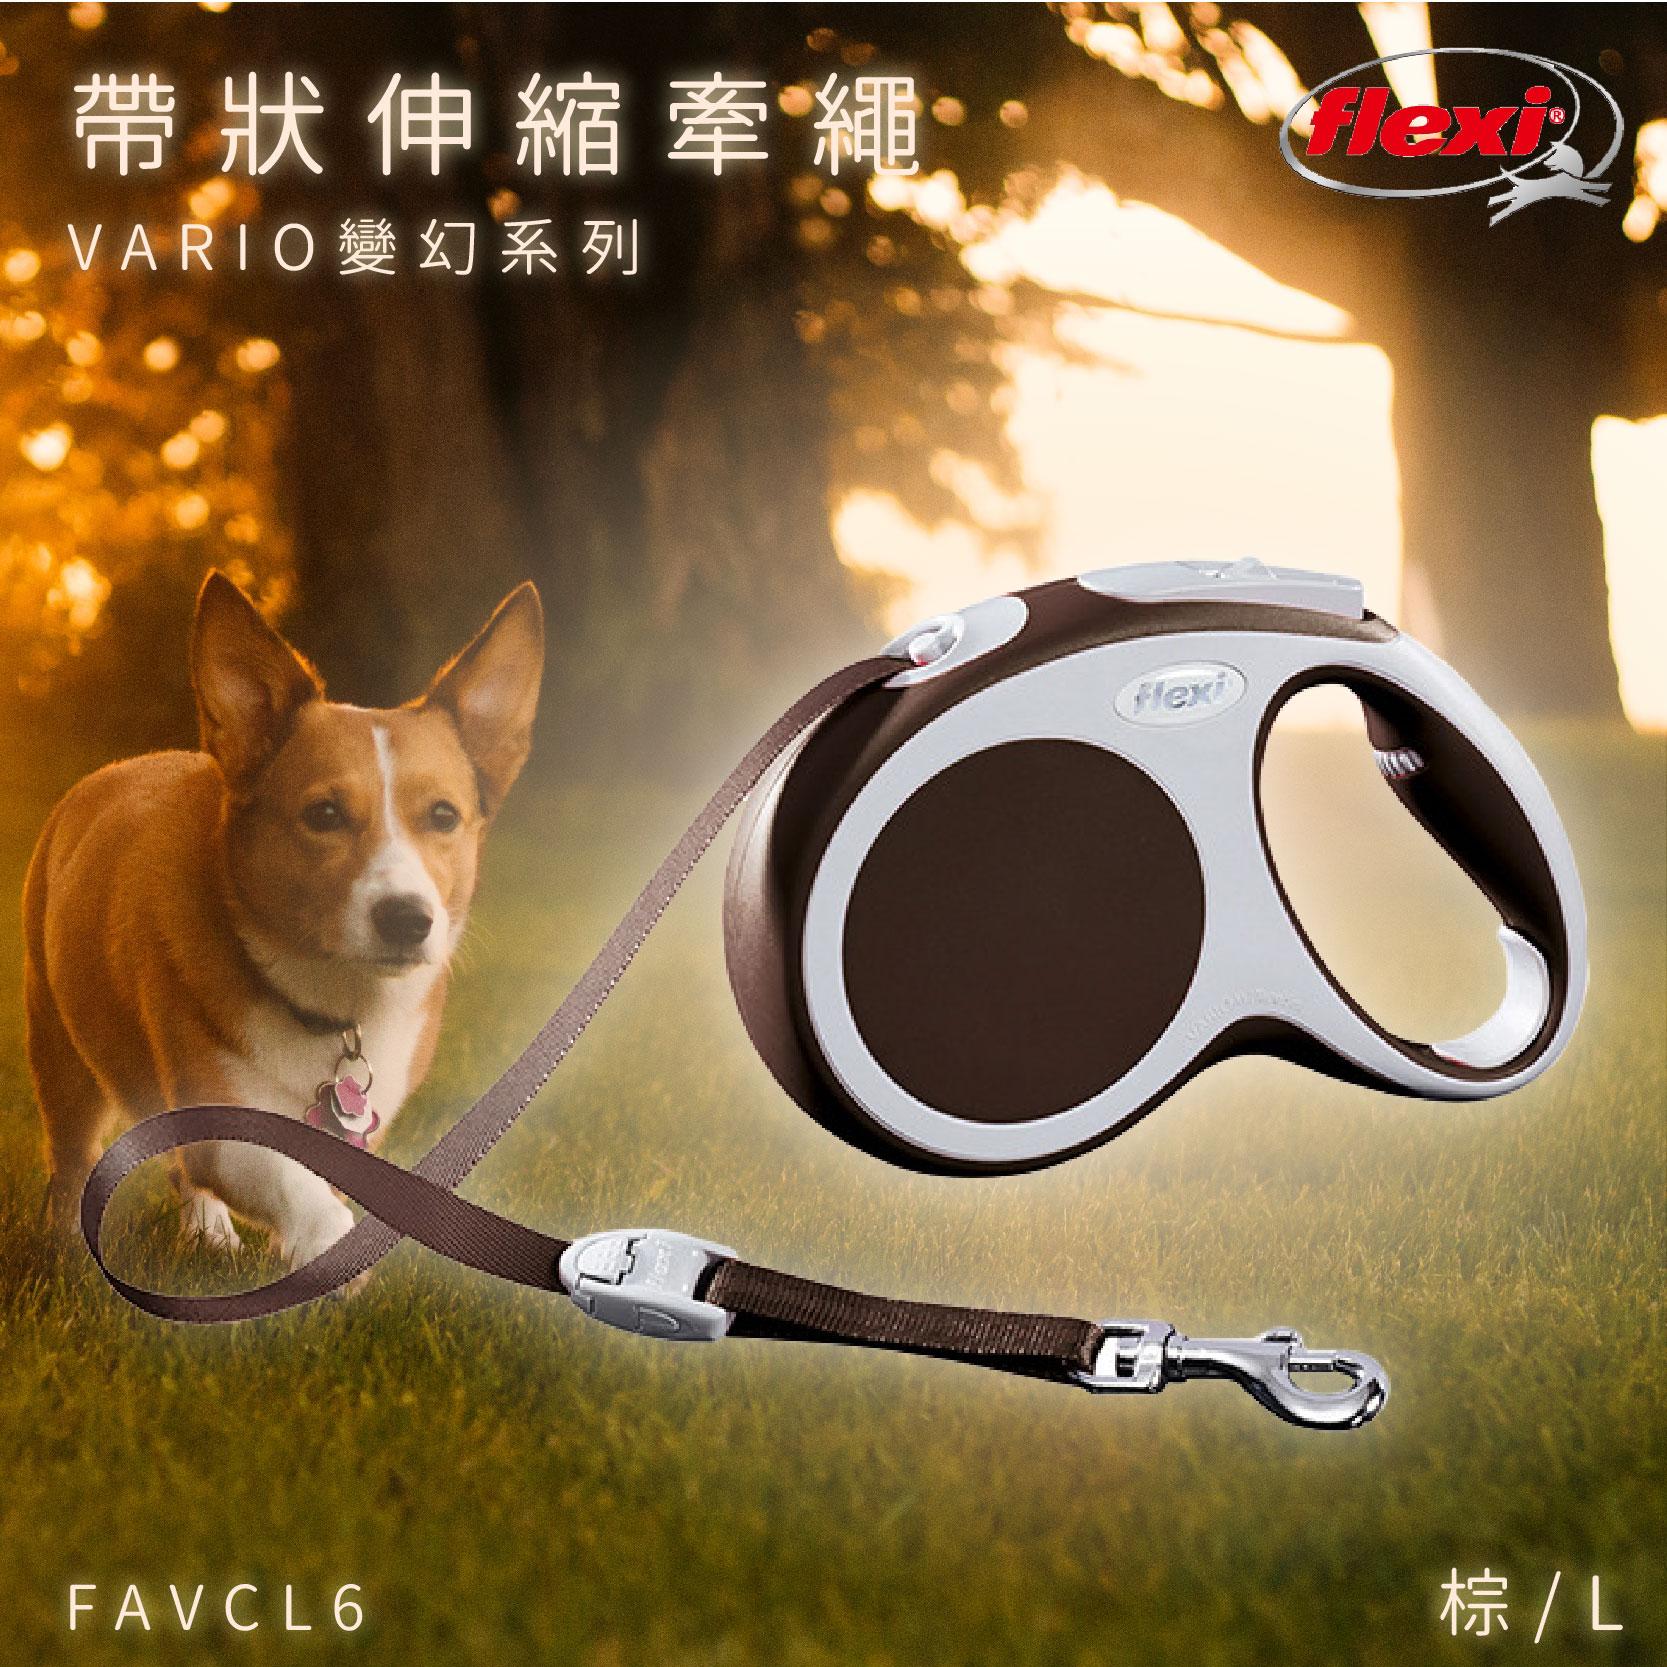 Flexi 帶狀寵物牽繩 棕L FAVCL6 變幻系列 舒適握把 狗貓 外出用品 寵物用品 寵物牽繩 德國製